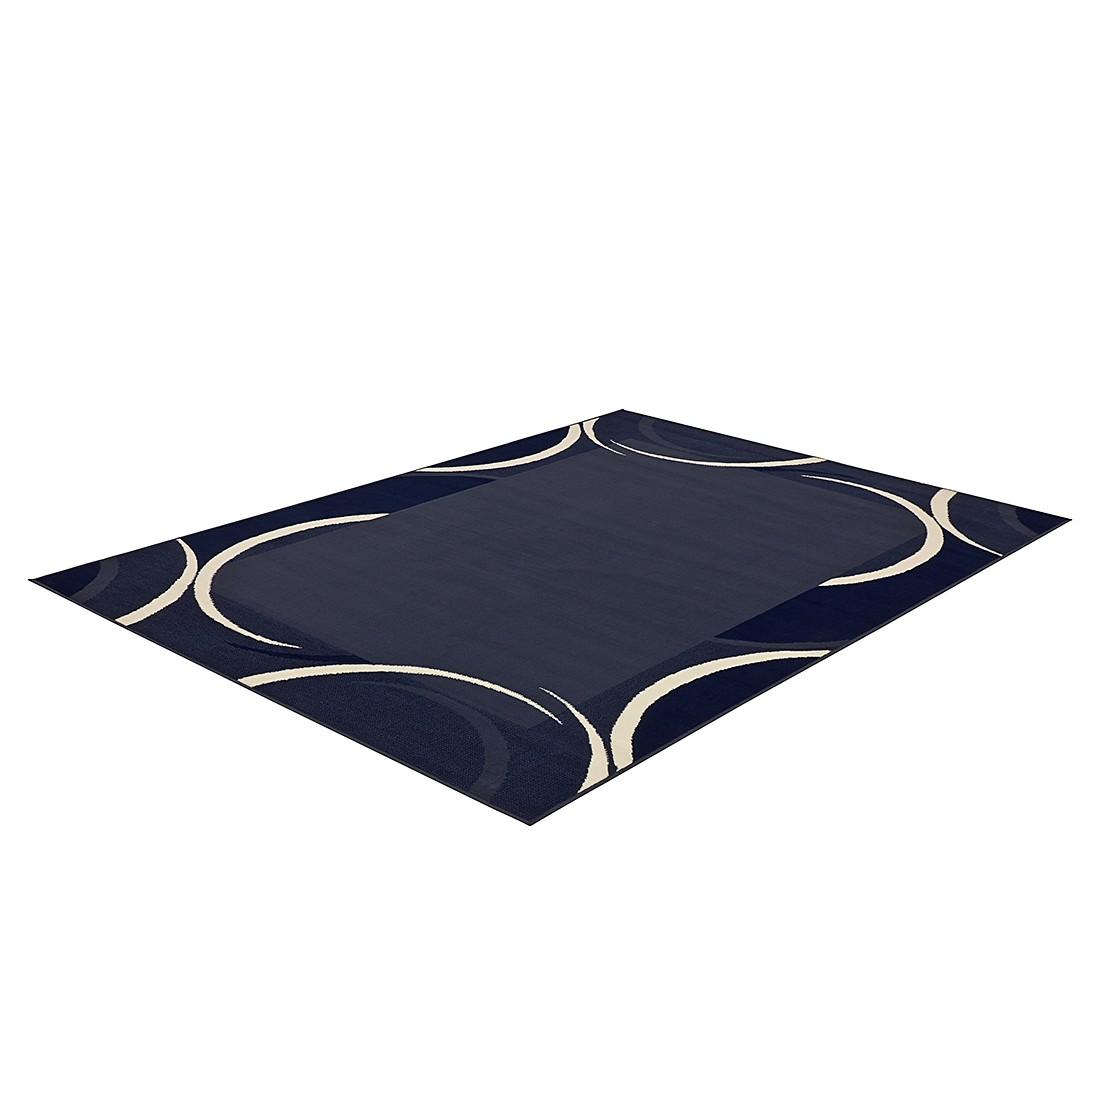 Teppich Prime Pile Circular – Blau – 120 x 170 cm, Hanse Home Collection online bestellen